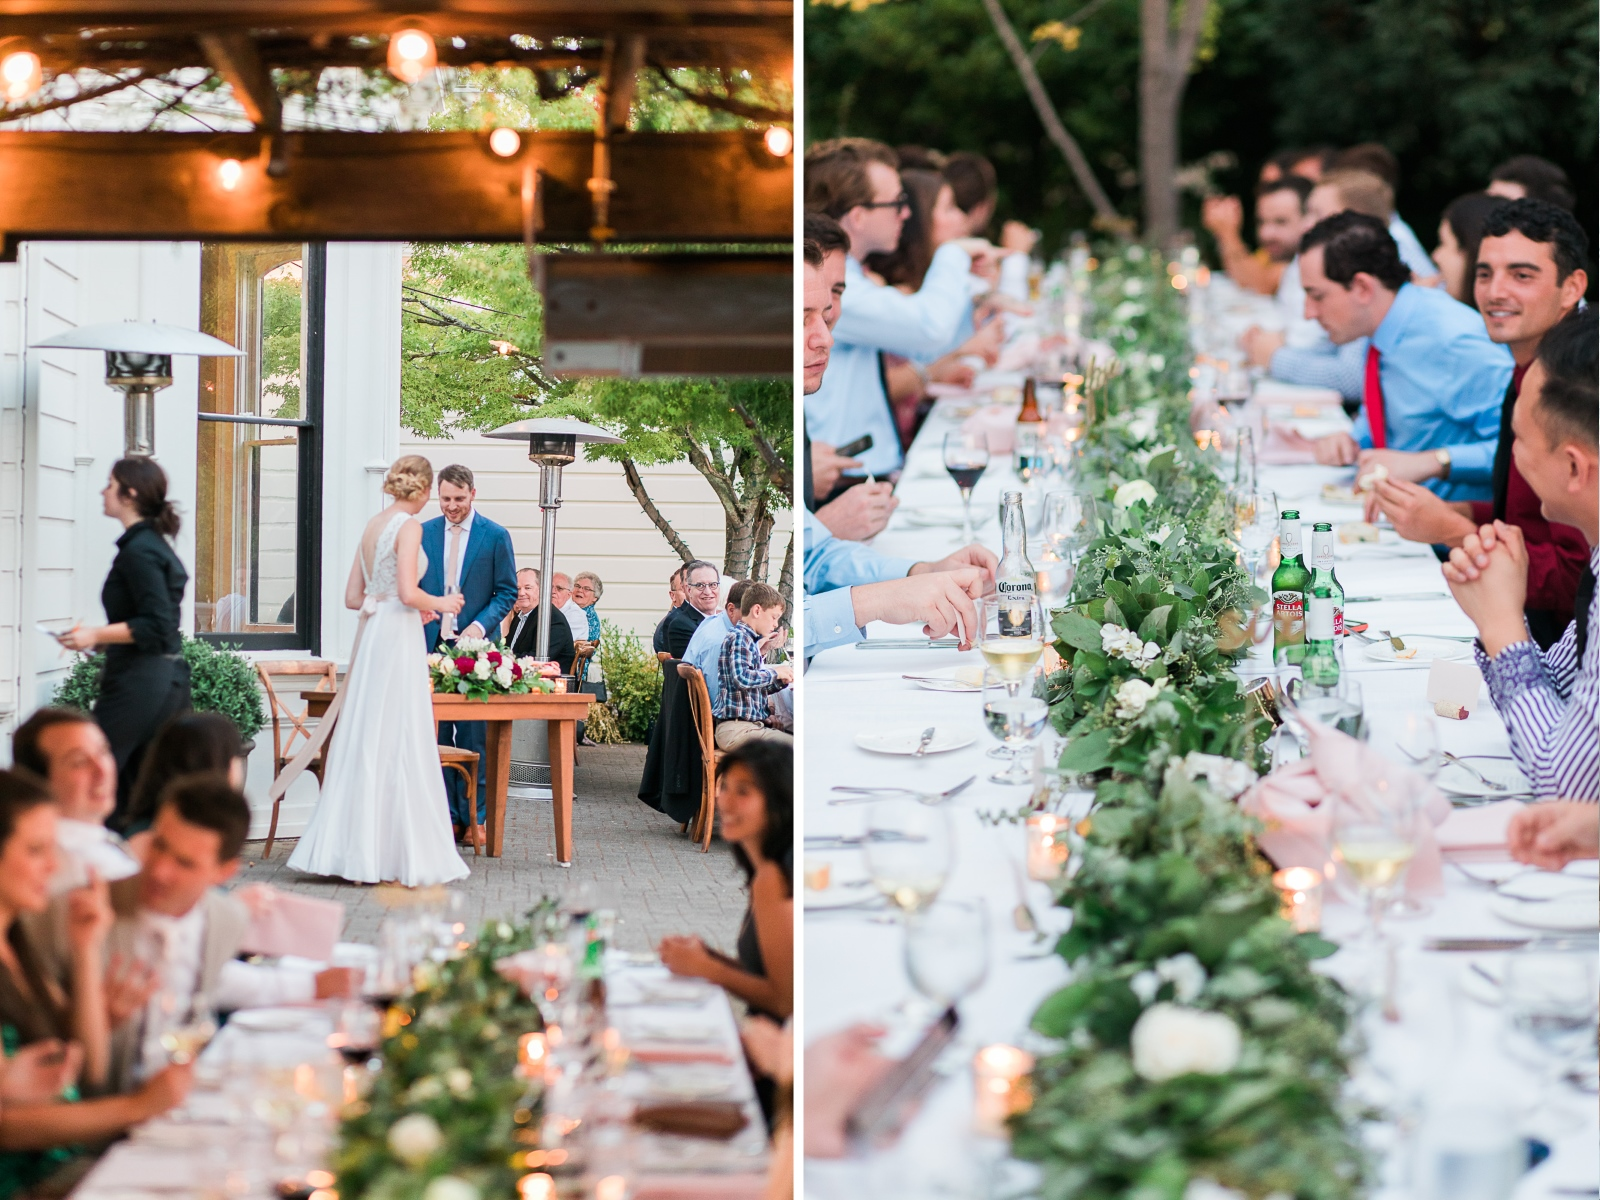 Generals+Daughter+Wedding+Photos+by+JBJ+Pictures+-+Ramekins+Wedding+Venue+Photographer+in+Sonoma+Napa+(41).jpg